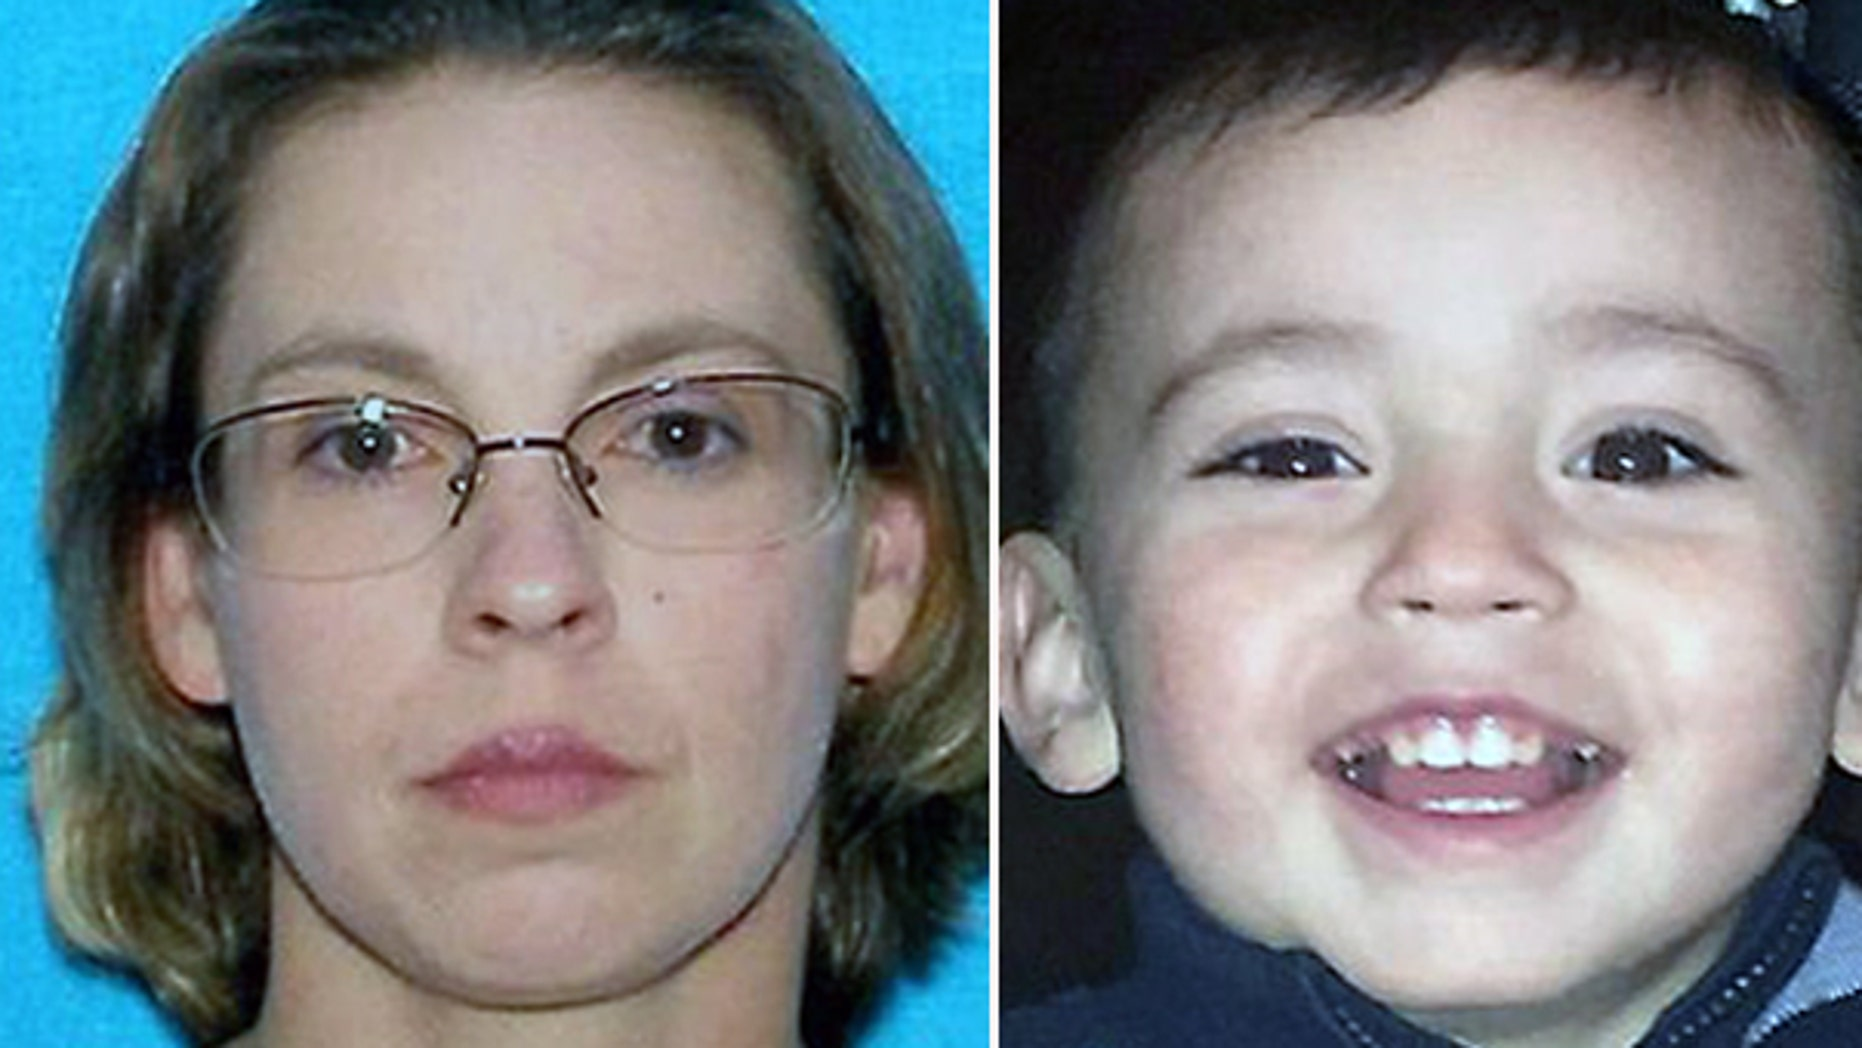 Missing Kansas boy, 3, found encased in concrete